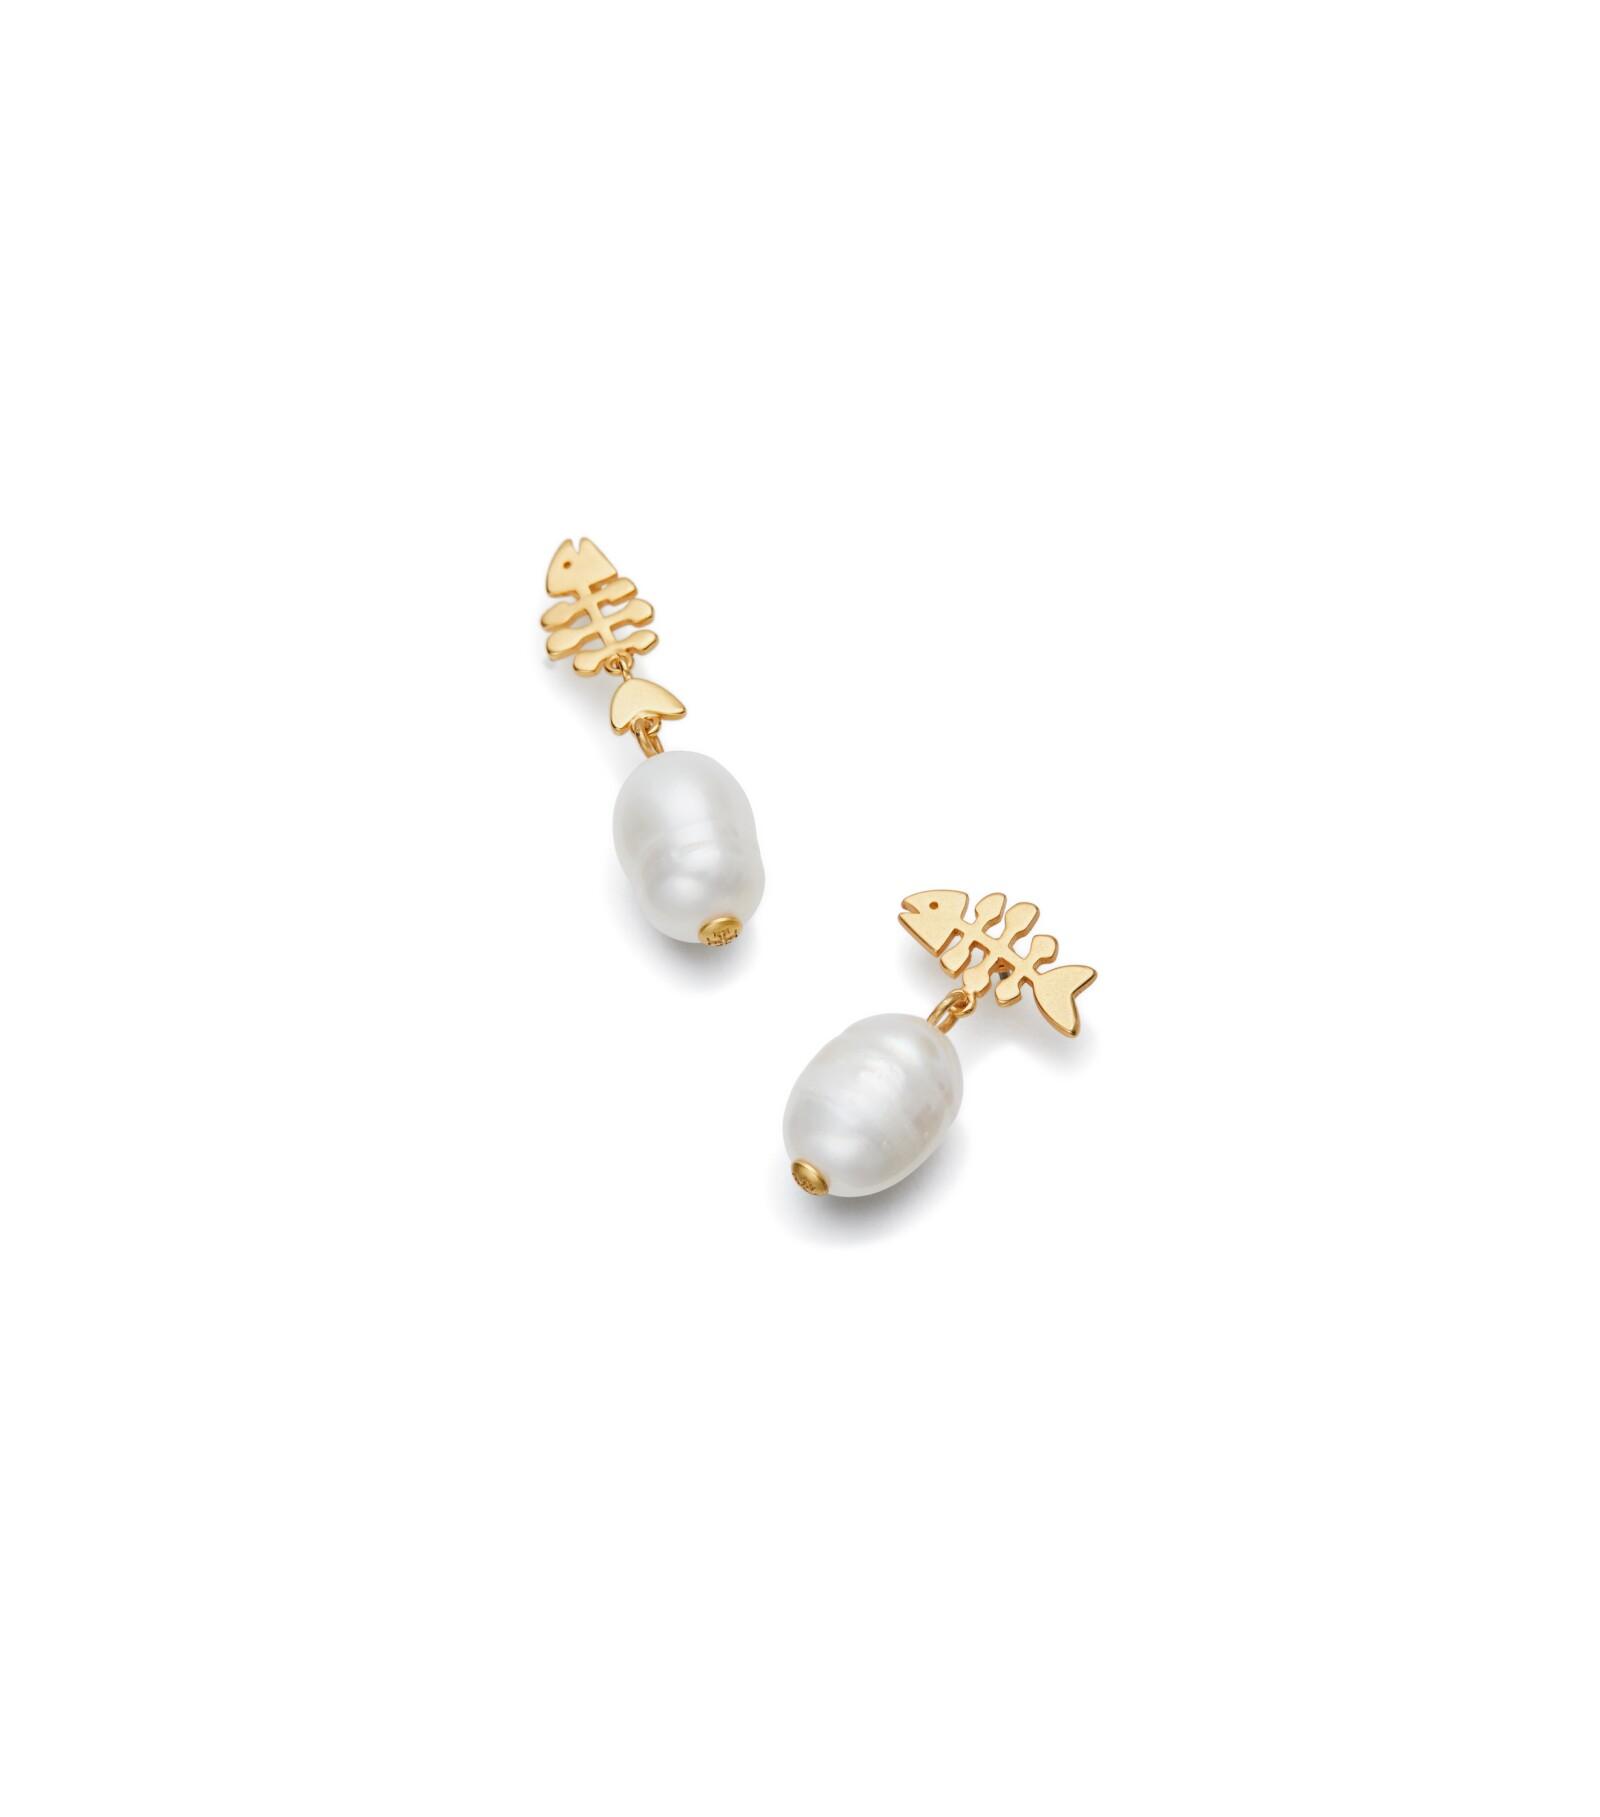 TB Fish And Pearl Drop Earrings 55243 in Vintage Gold, Pearl.jpg